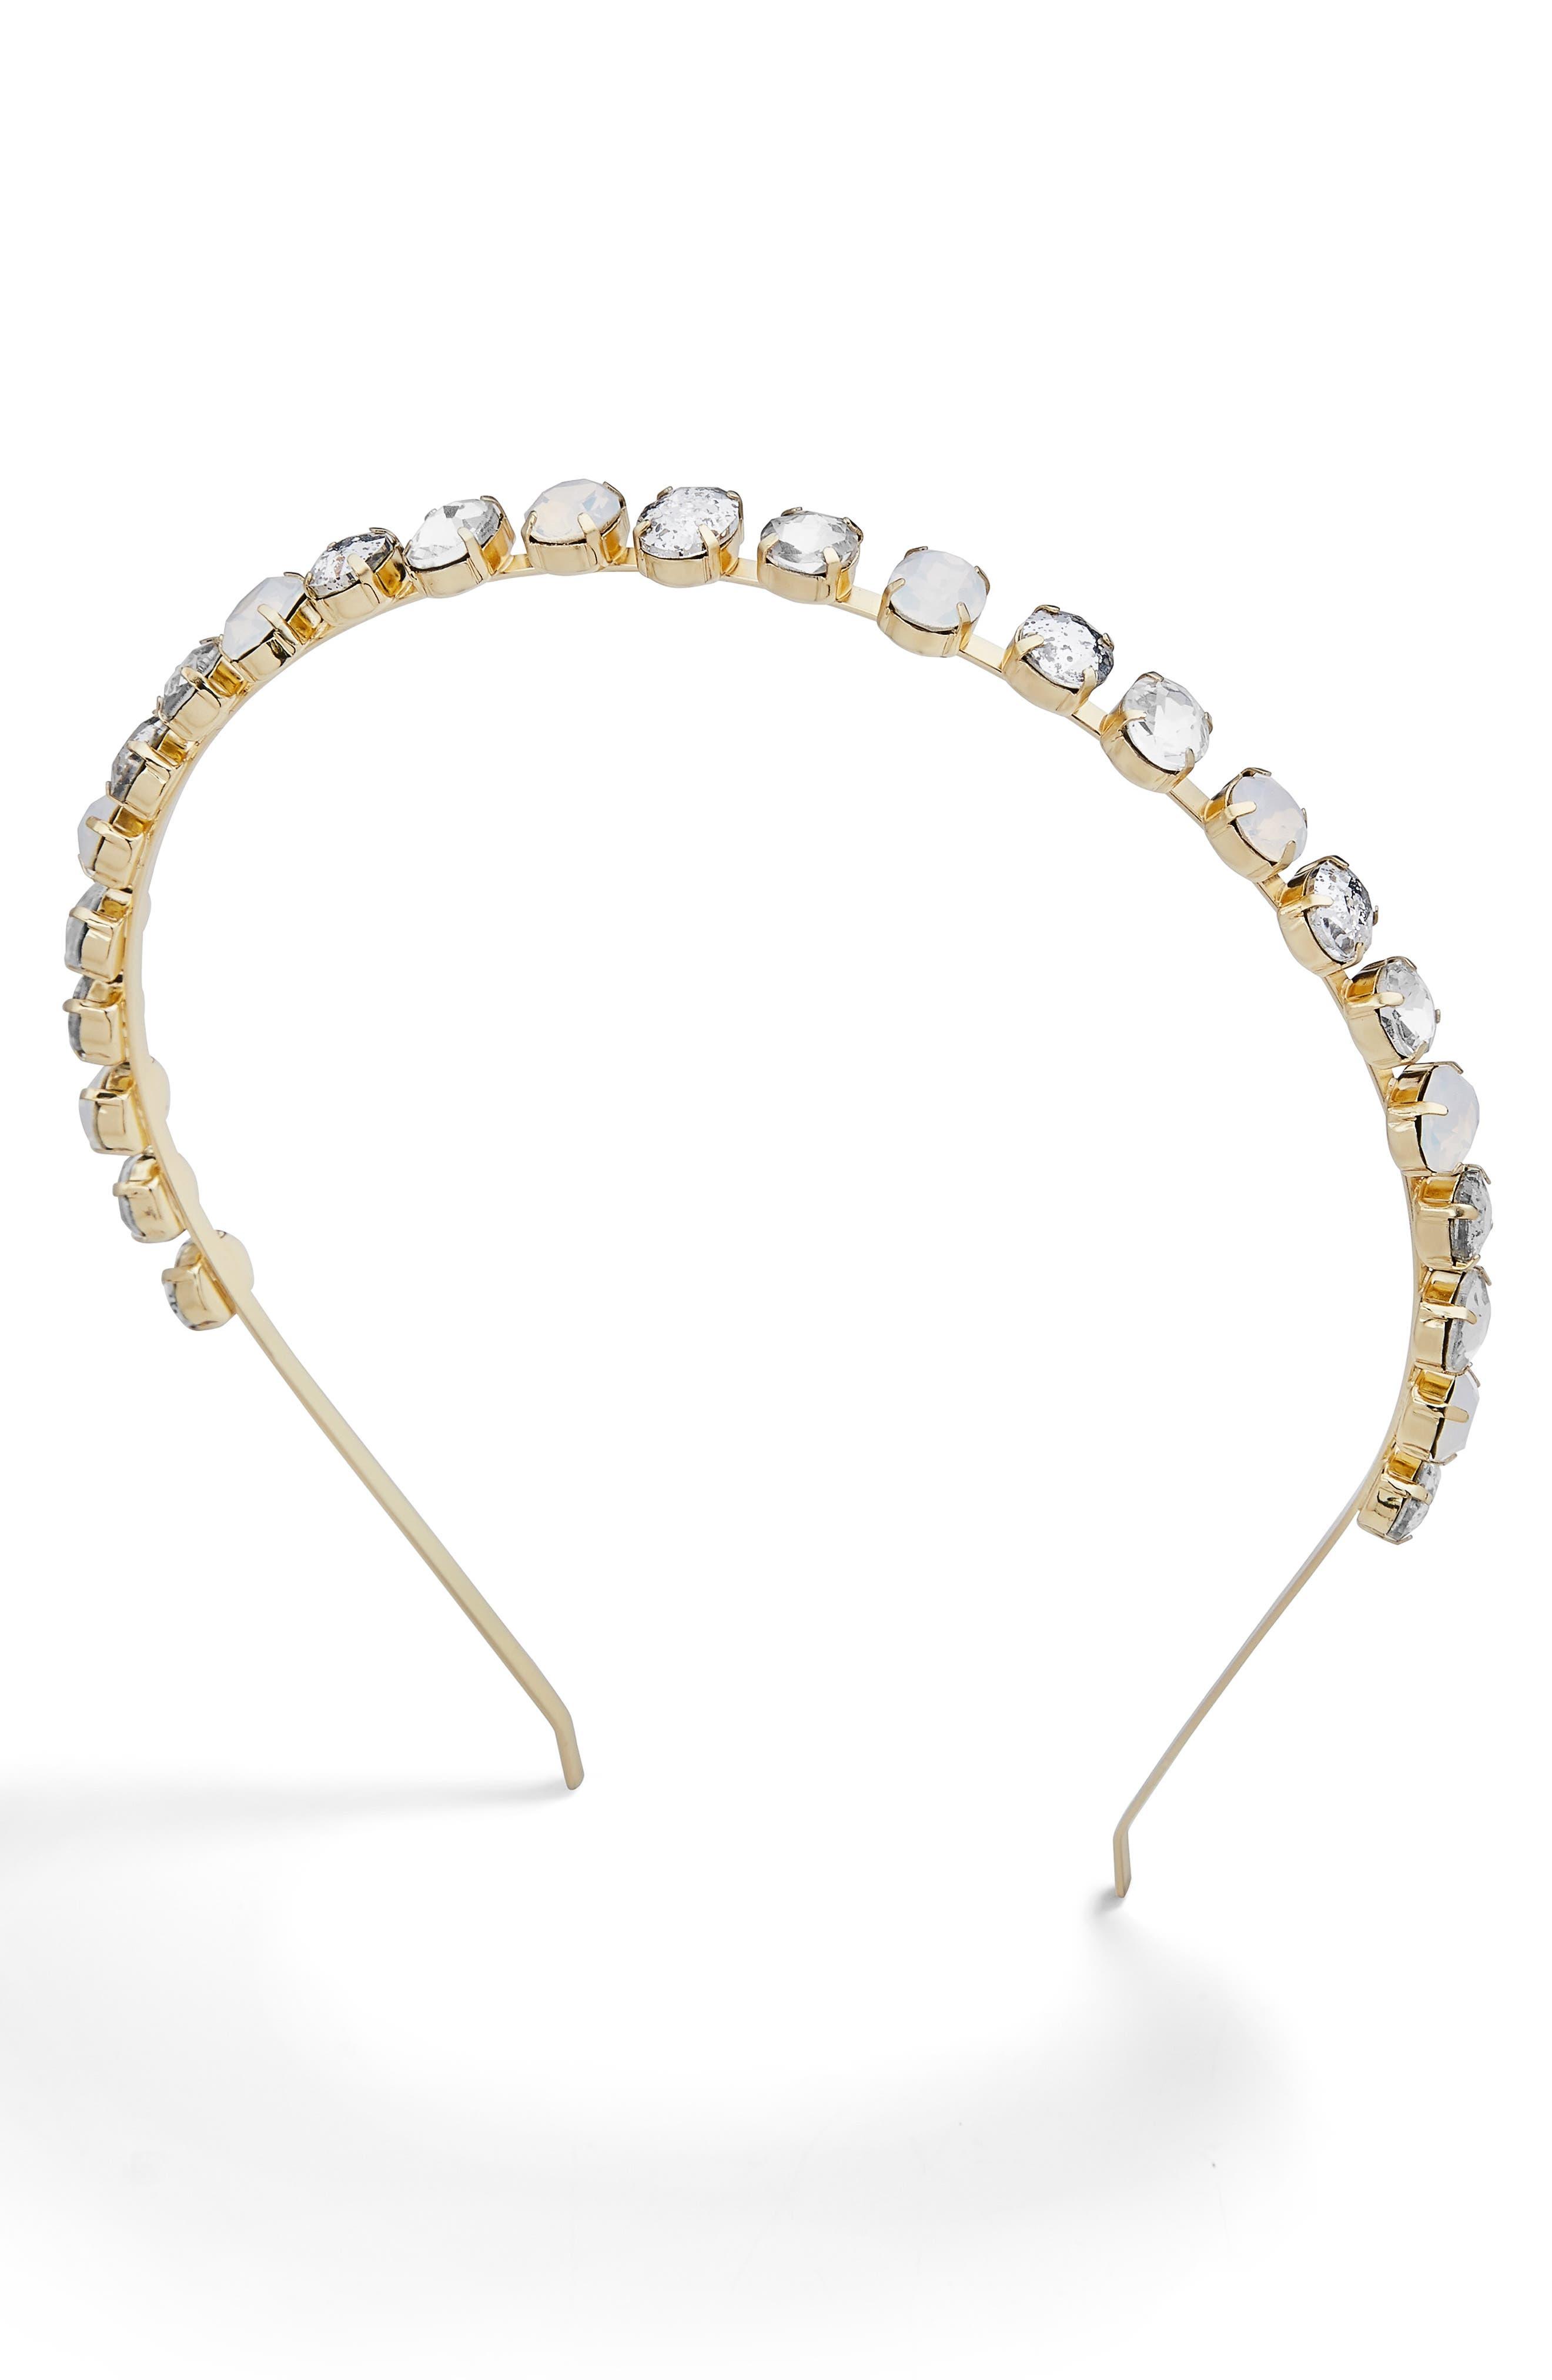 x Micaela Erlanger Royal Treatment Embellished Headband,                             Main thumbnail 1, color,                             PASTEL MULTI/ GOLD